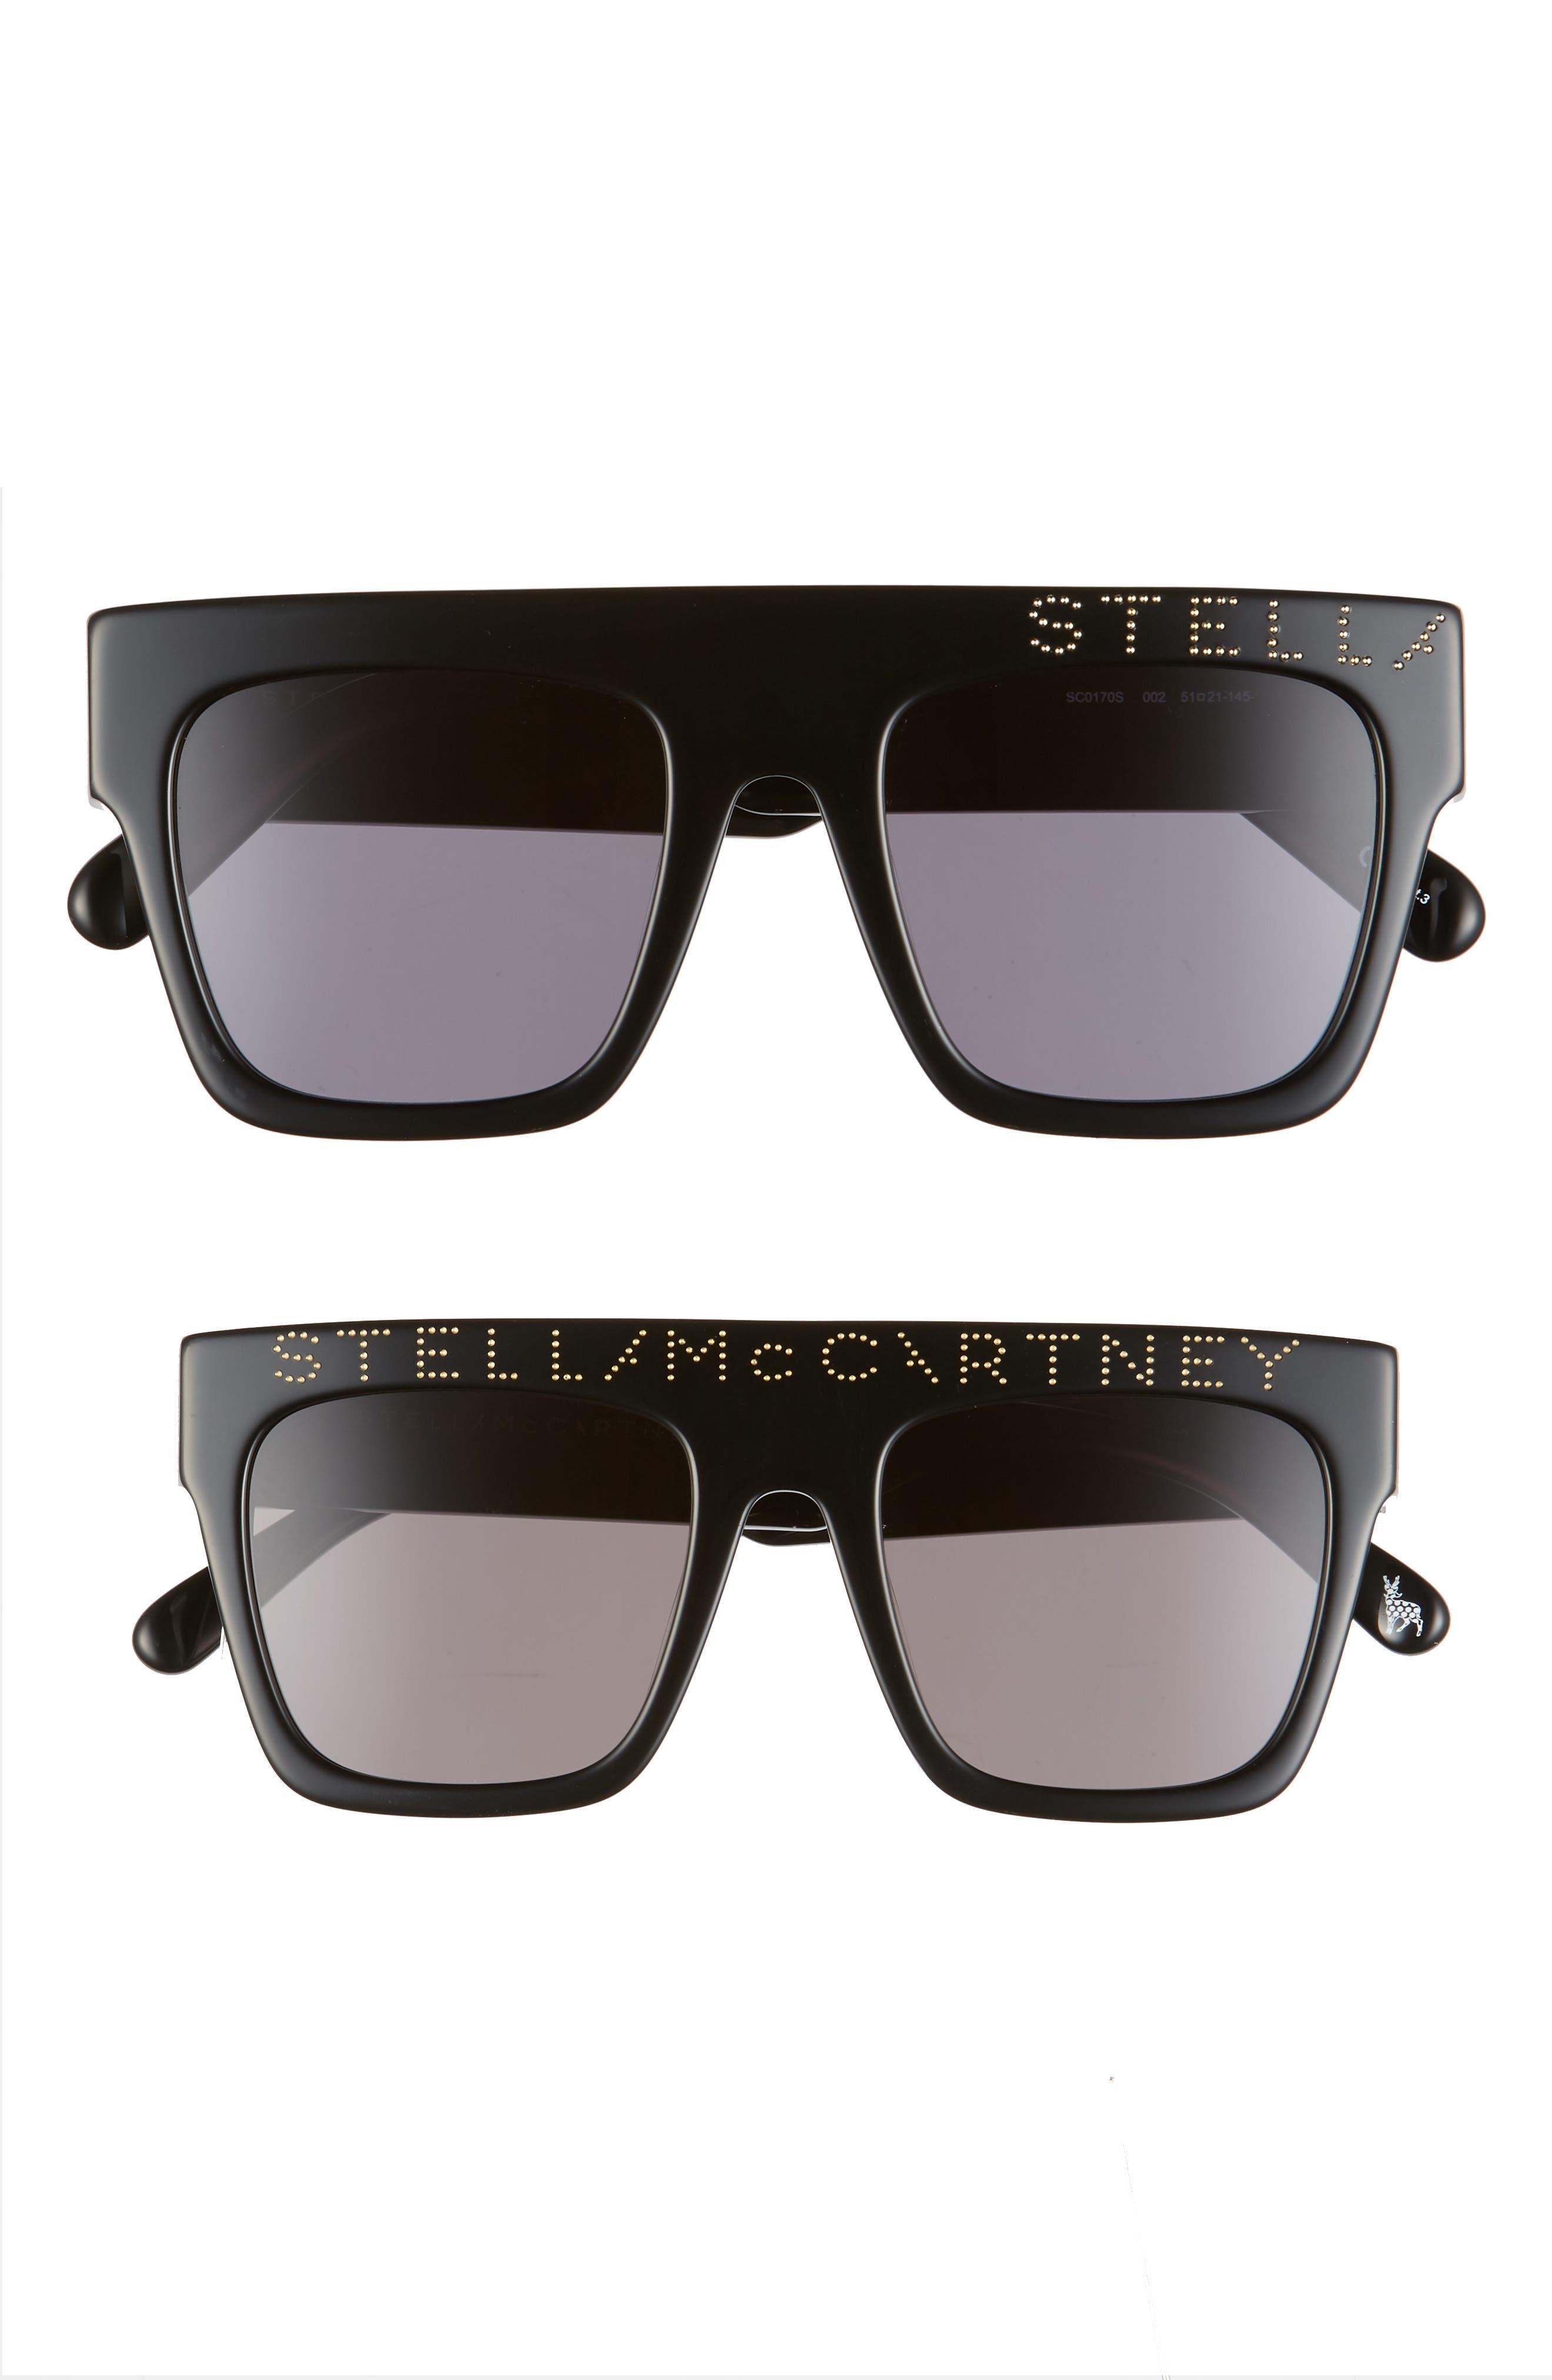 Stella Mccartney Mum & Me 51Mm Flat Top Sunglasses Set - Black